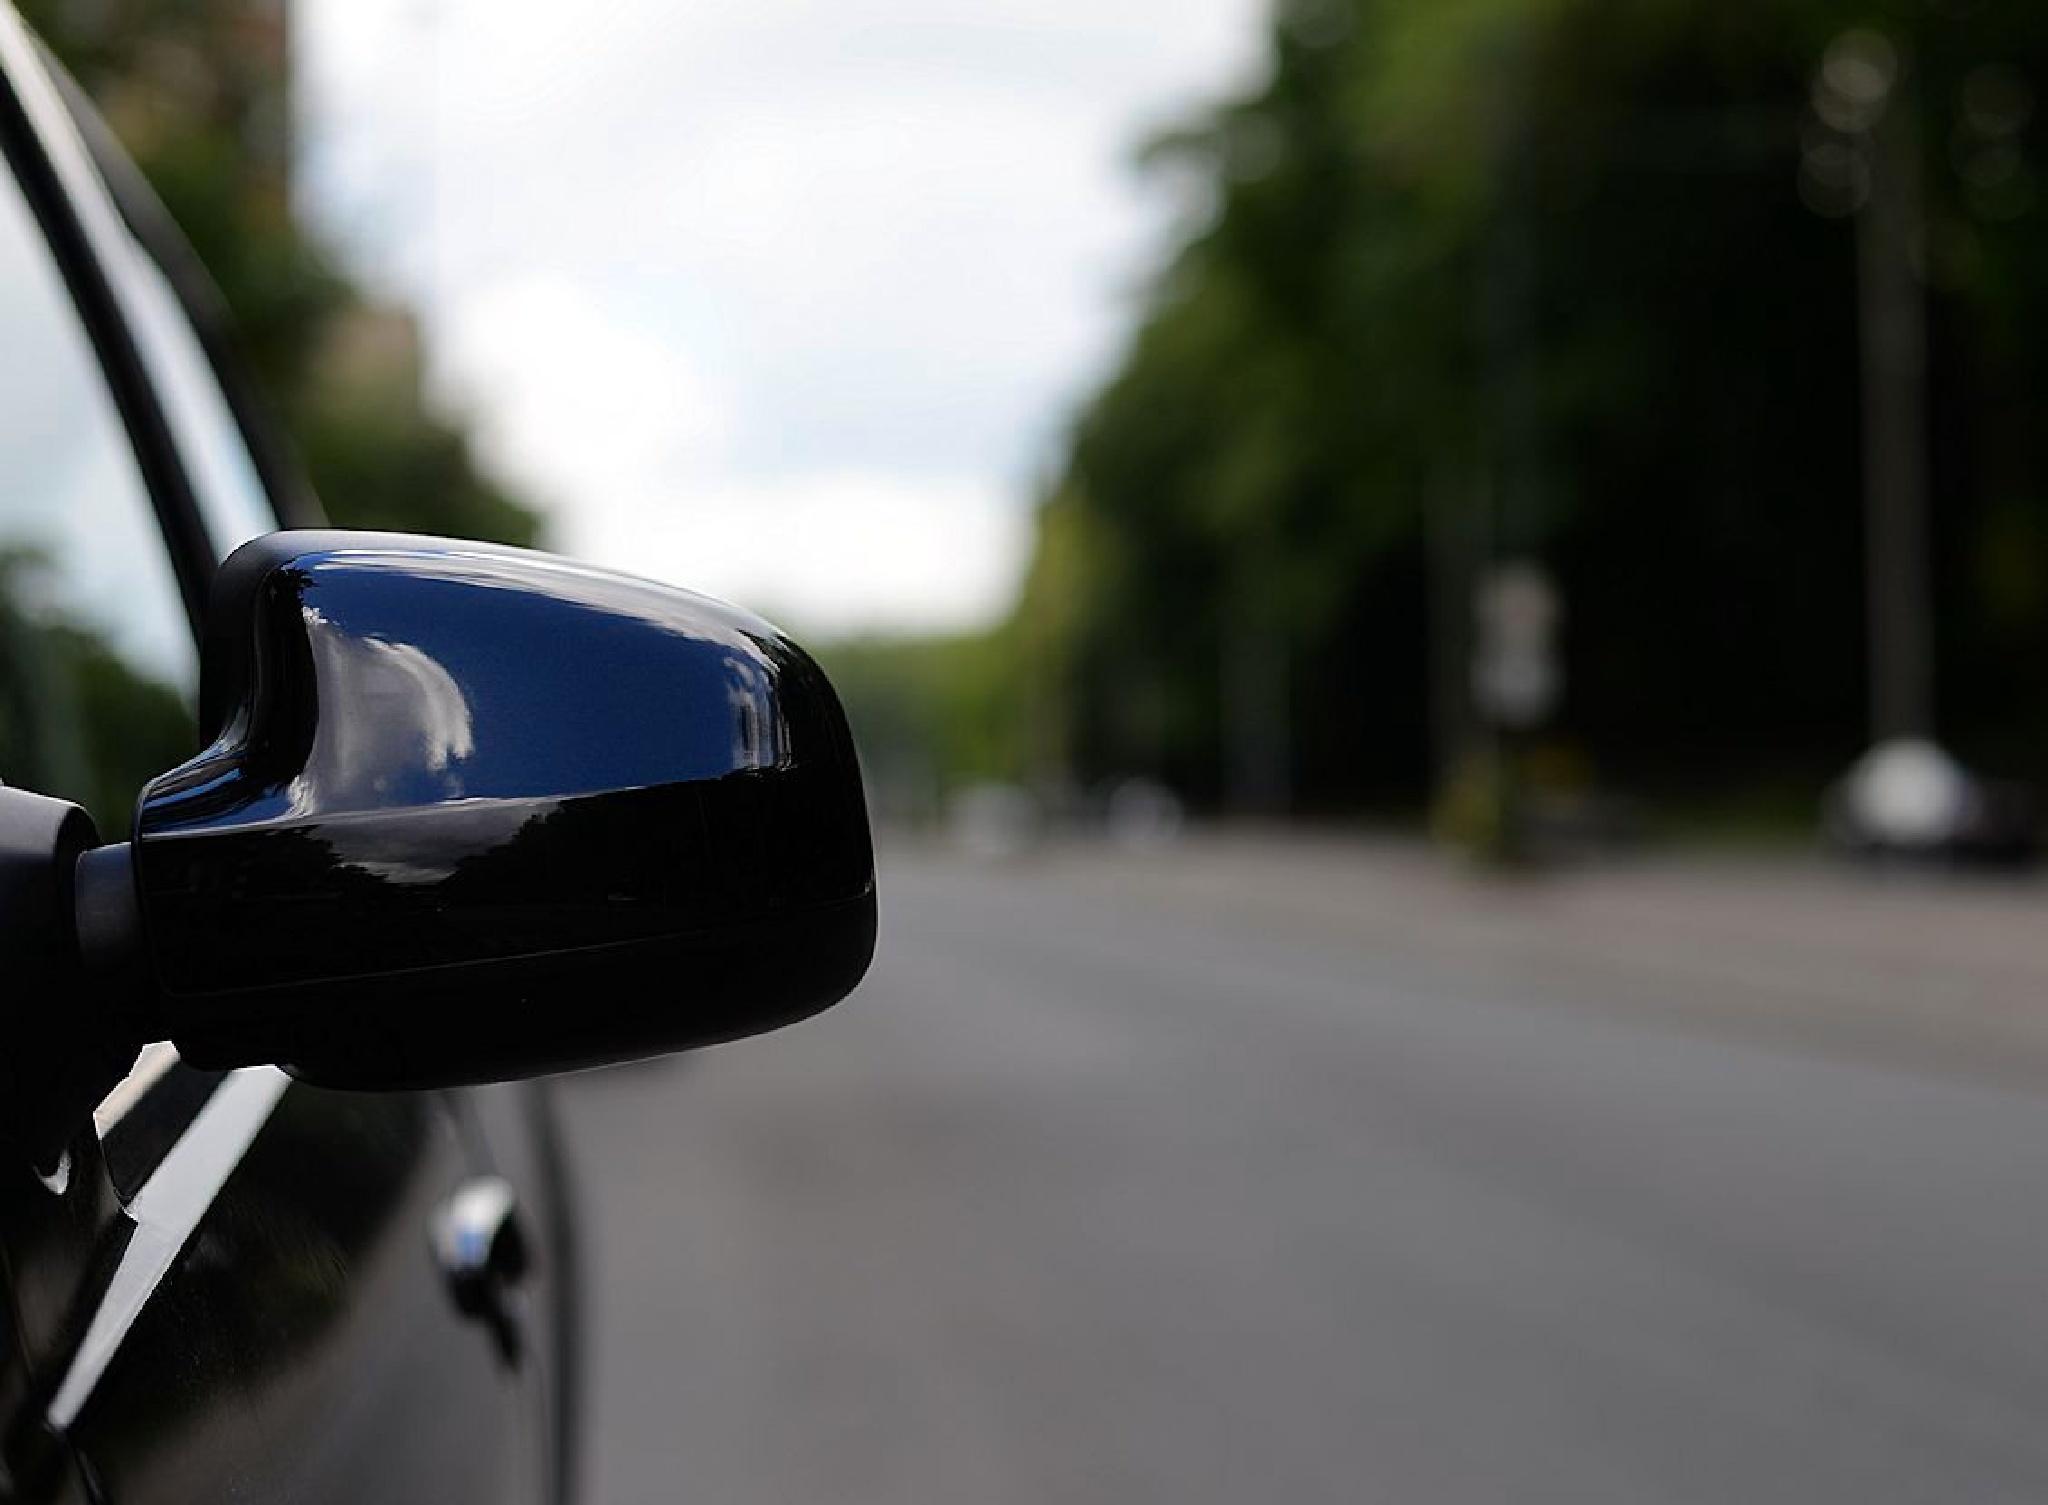 Rear view mirror by JPVD fotografie